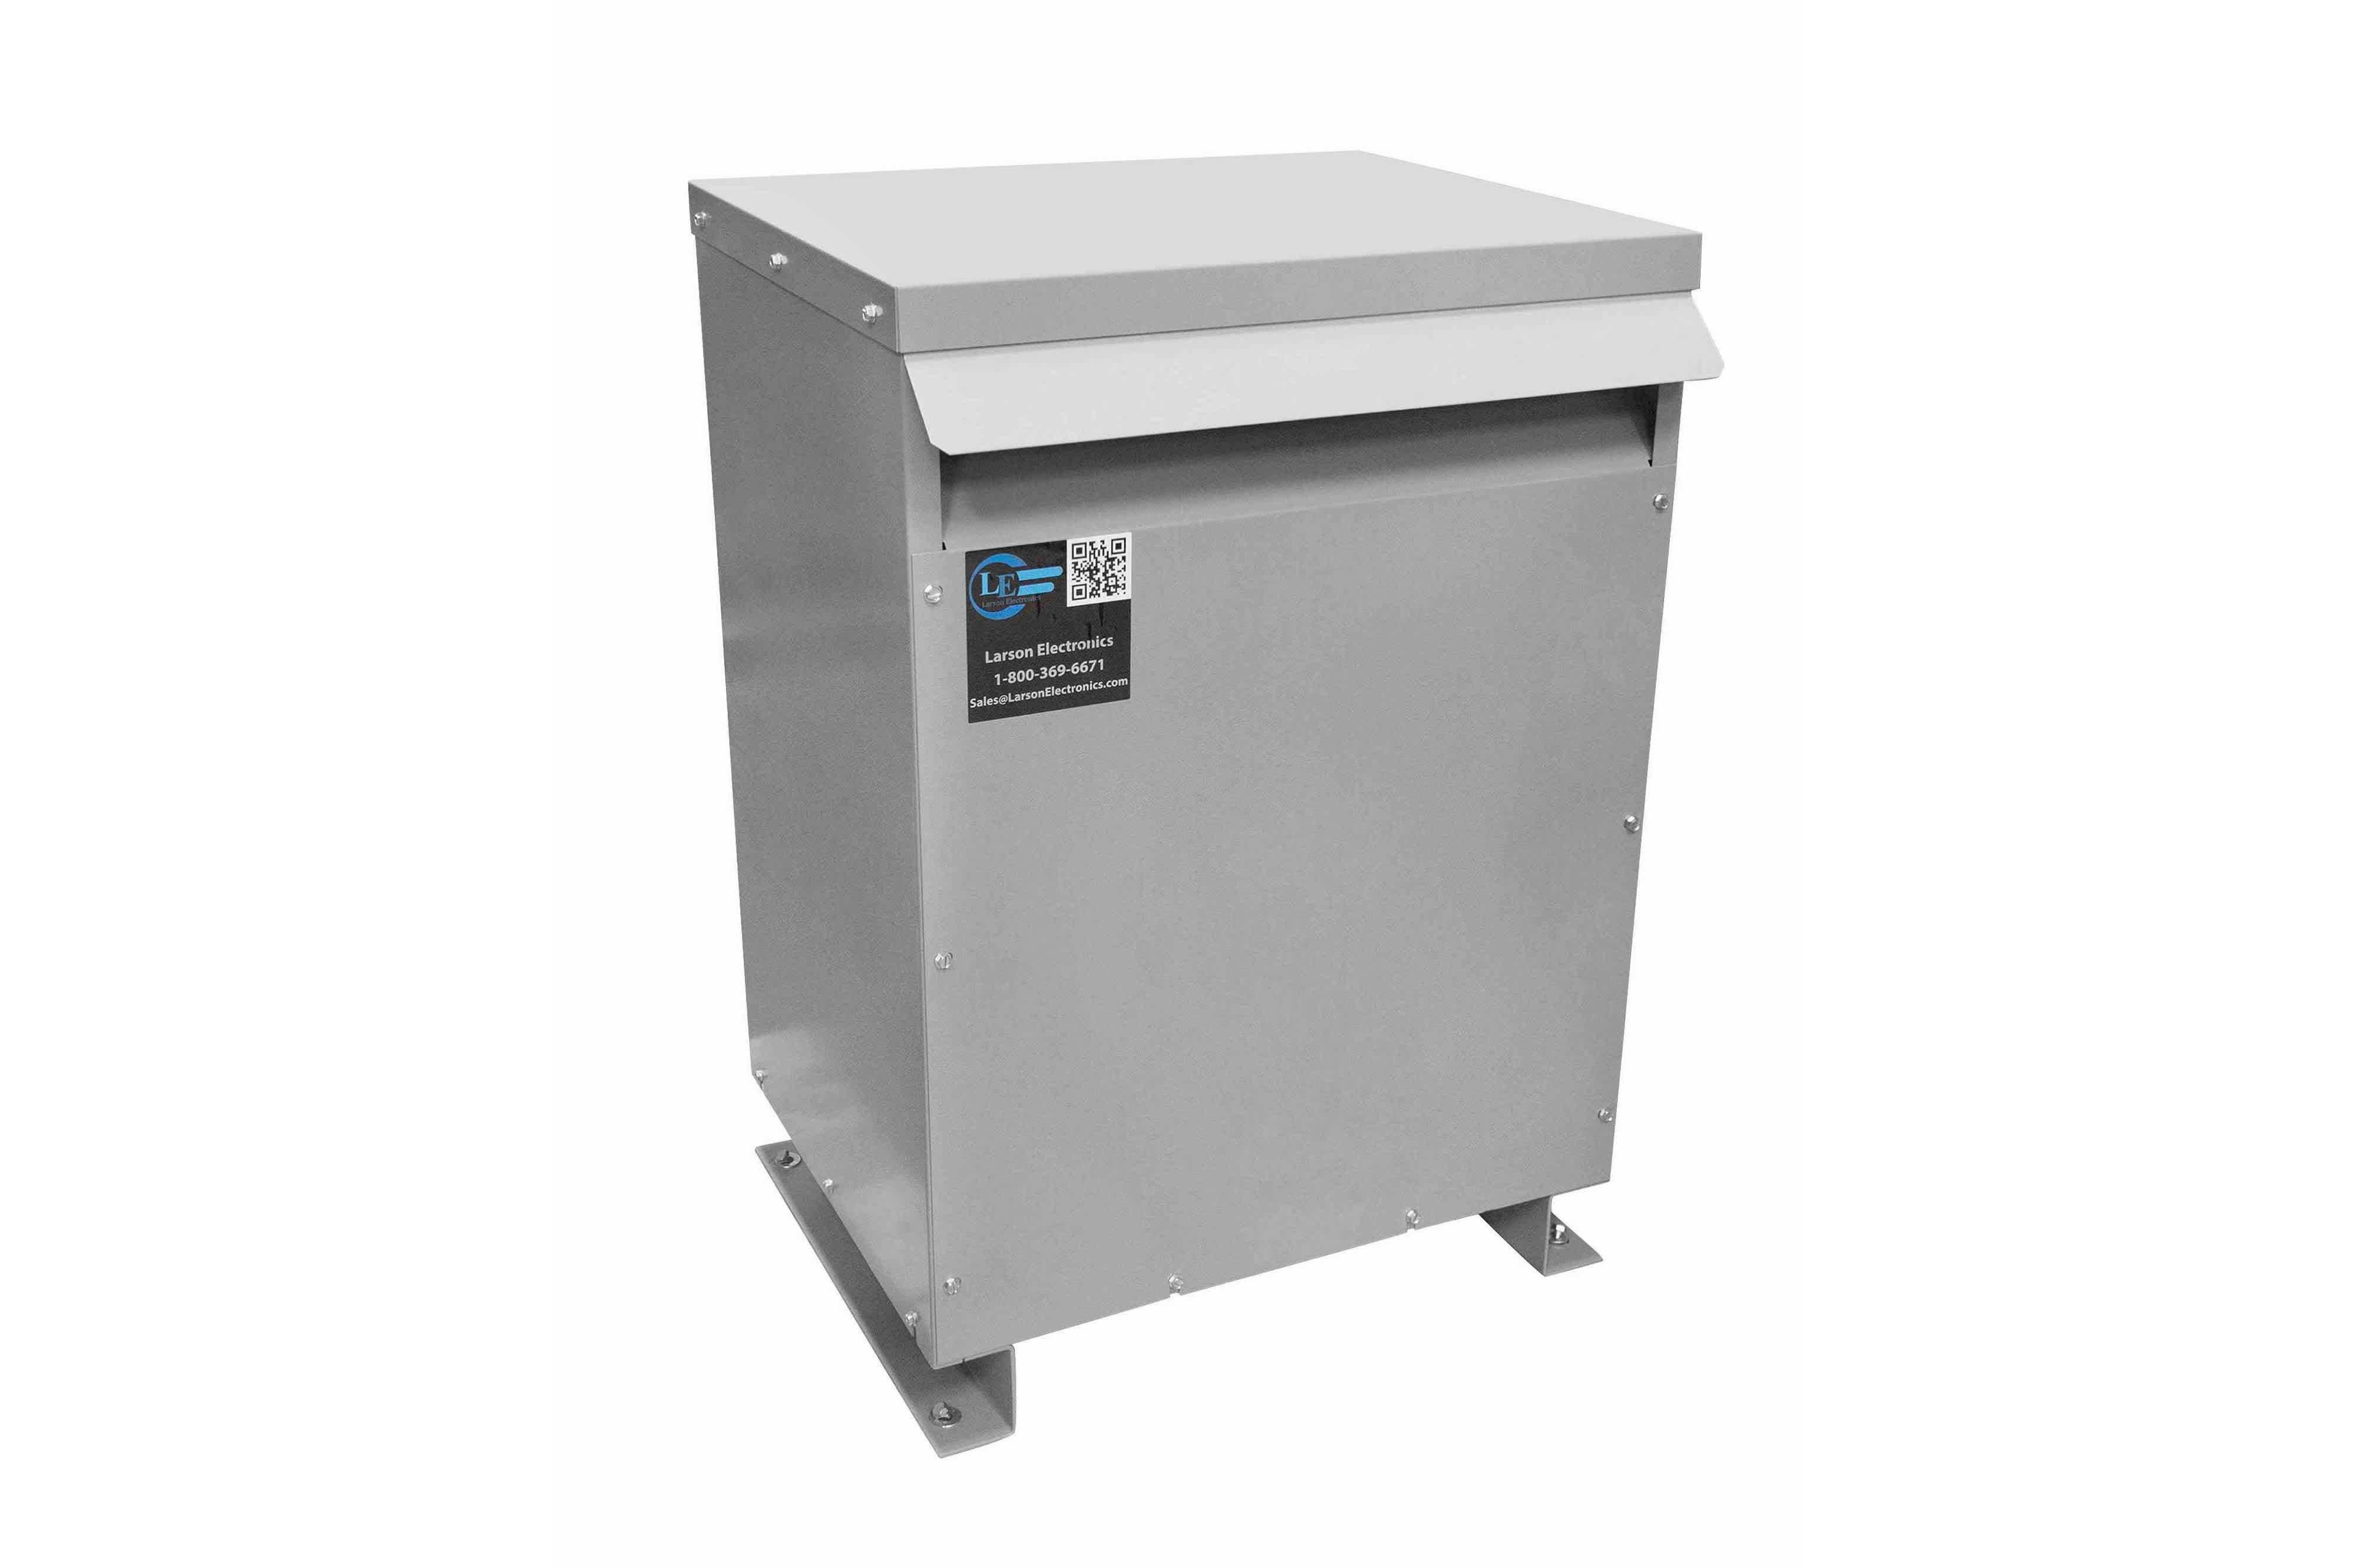 500 kVA 3PH Isolation Transformer, 460V Wye Primary, 400Y/231 Wye-N Secondary, N3R, Ventilated, 60 Hz